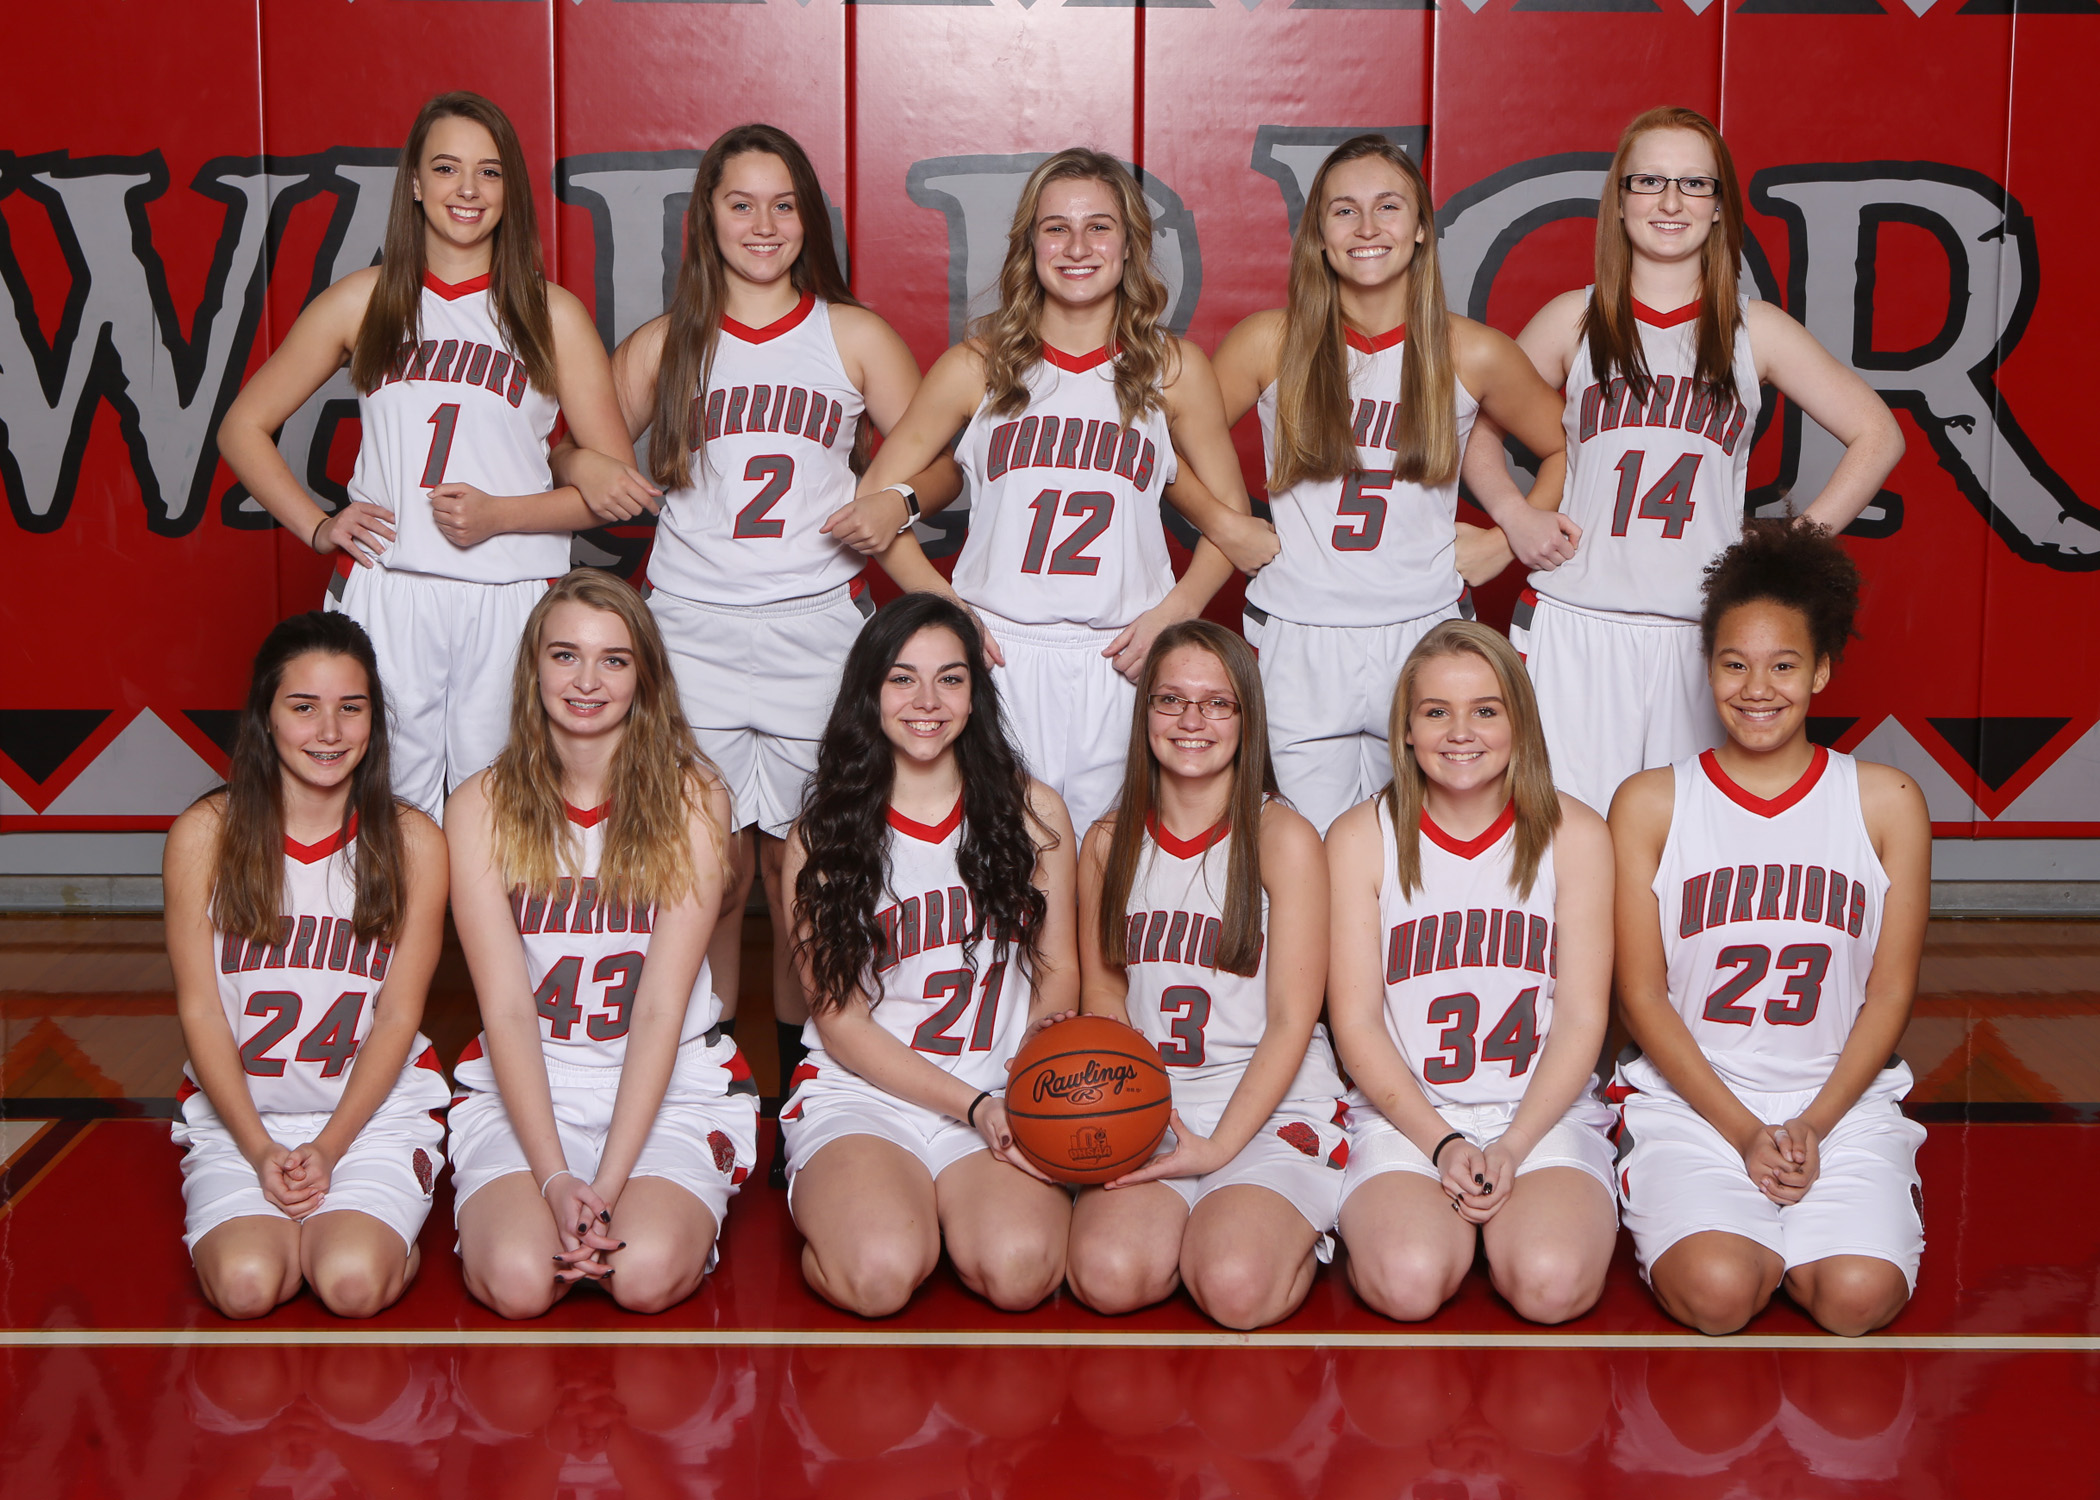 2018 Lady Warrior Basketball Camp